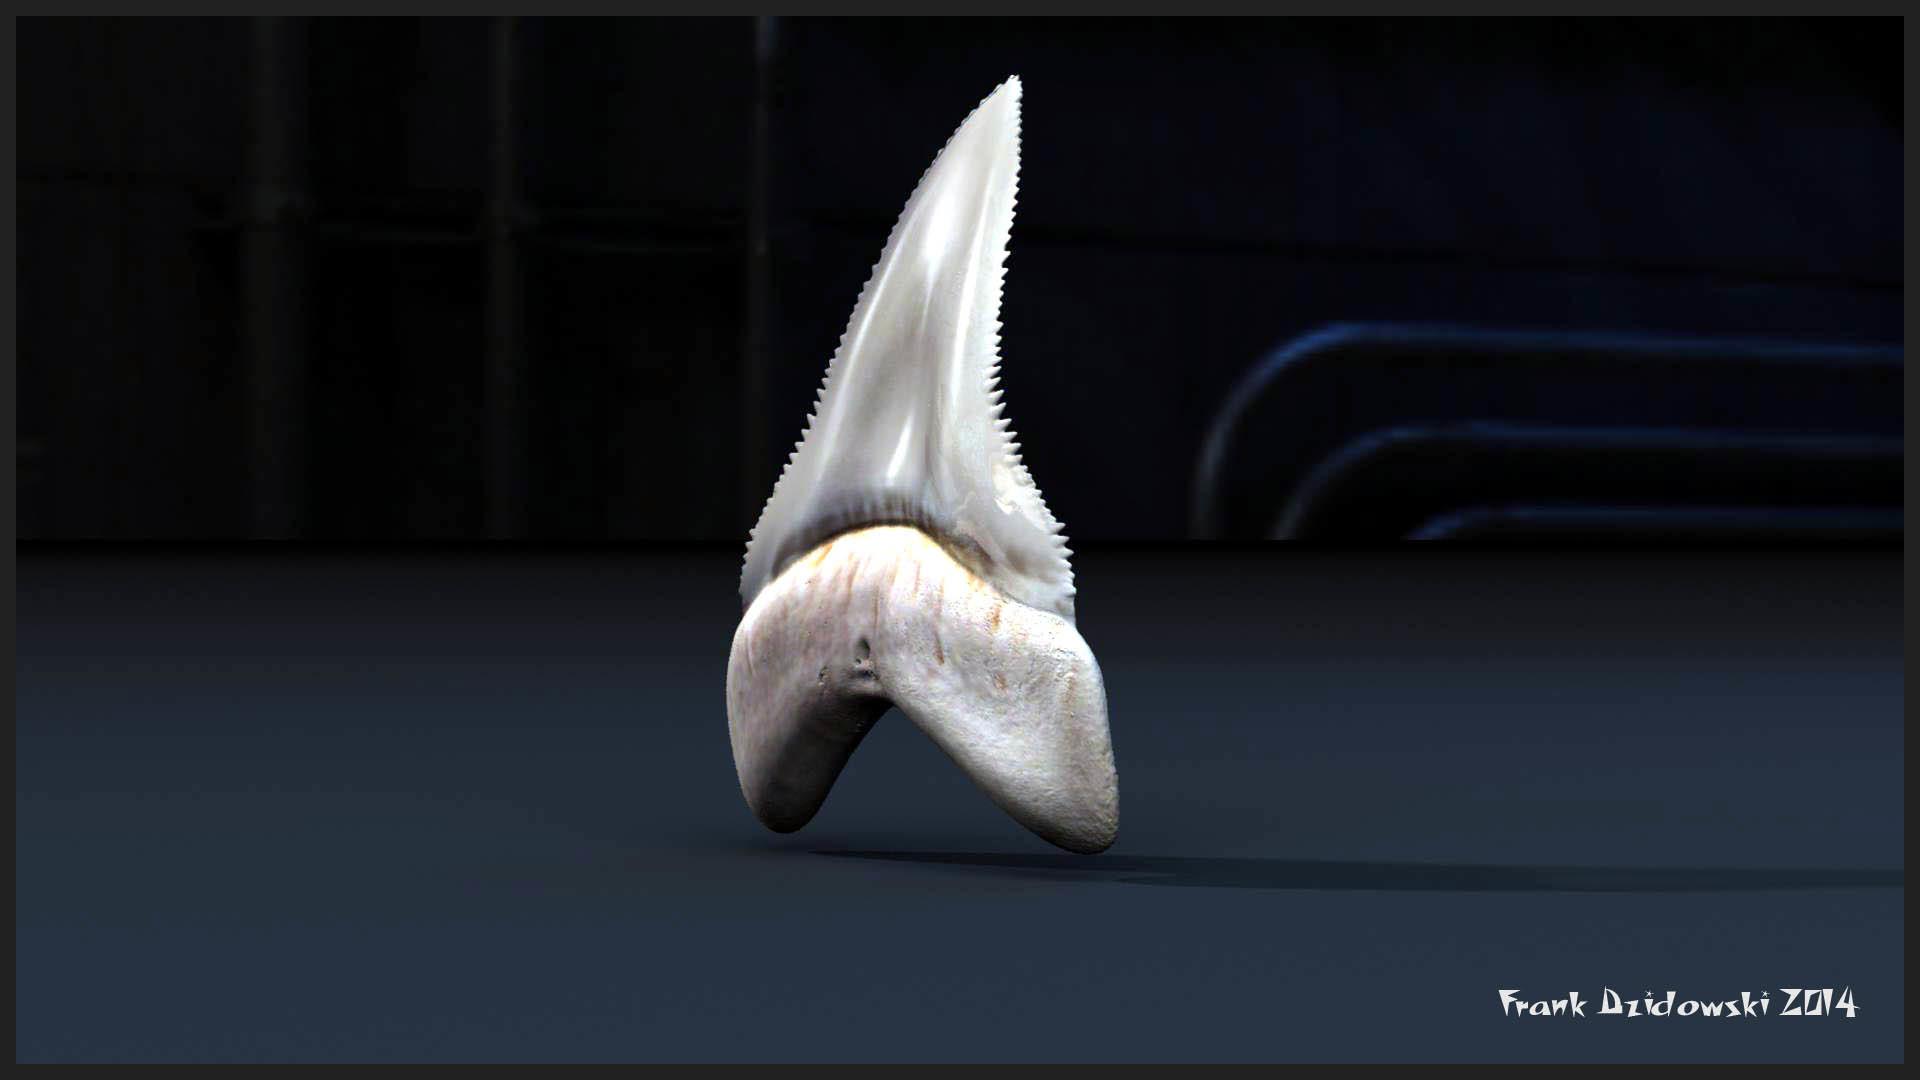 Frank dzidowski sharktooth v001a